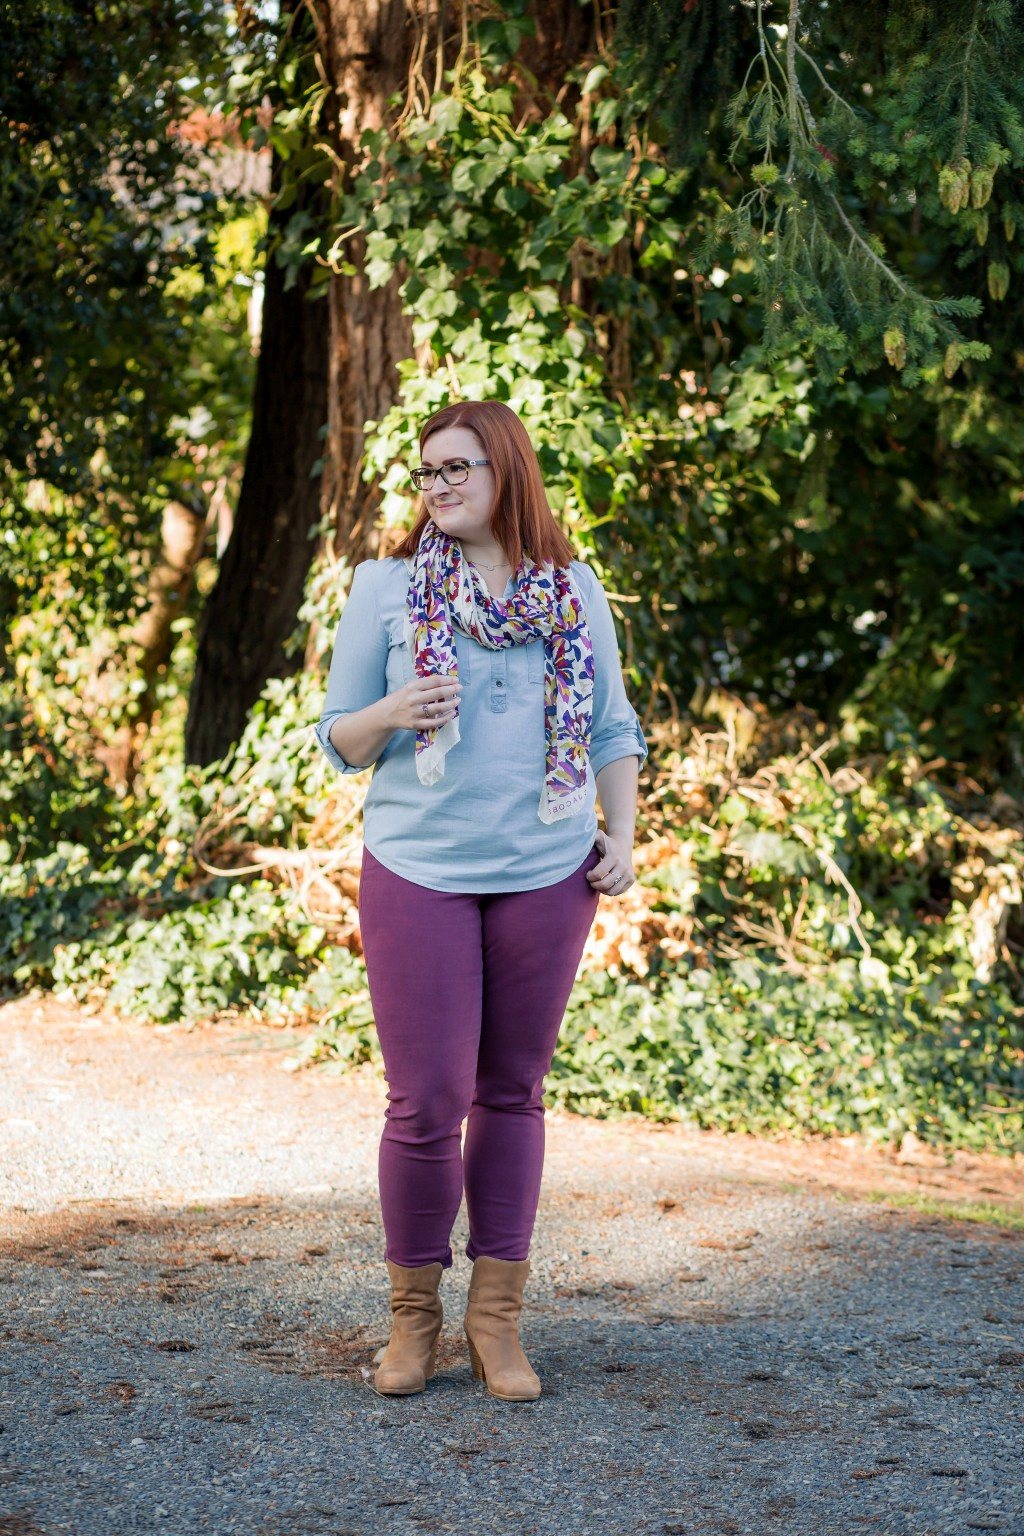 17-how-to-wear-maroon-skinny-jeans